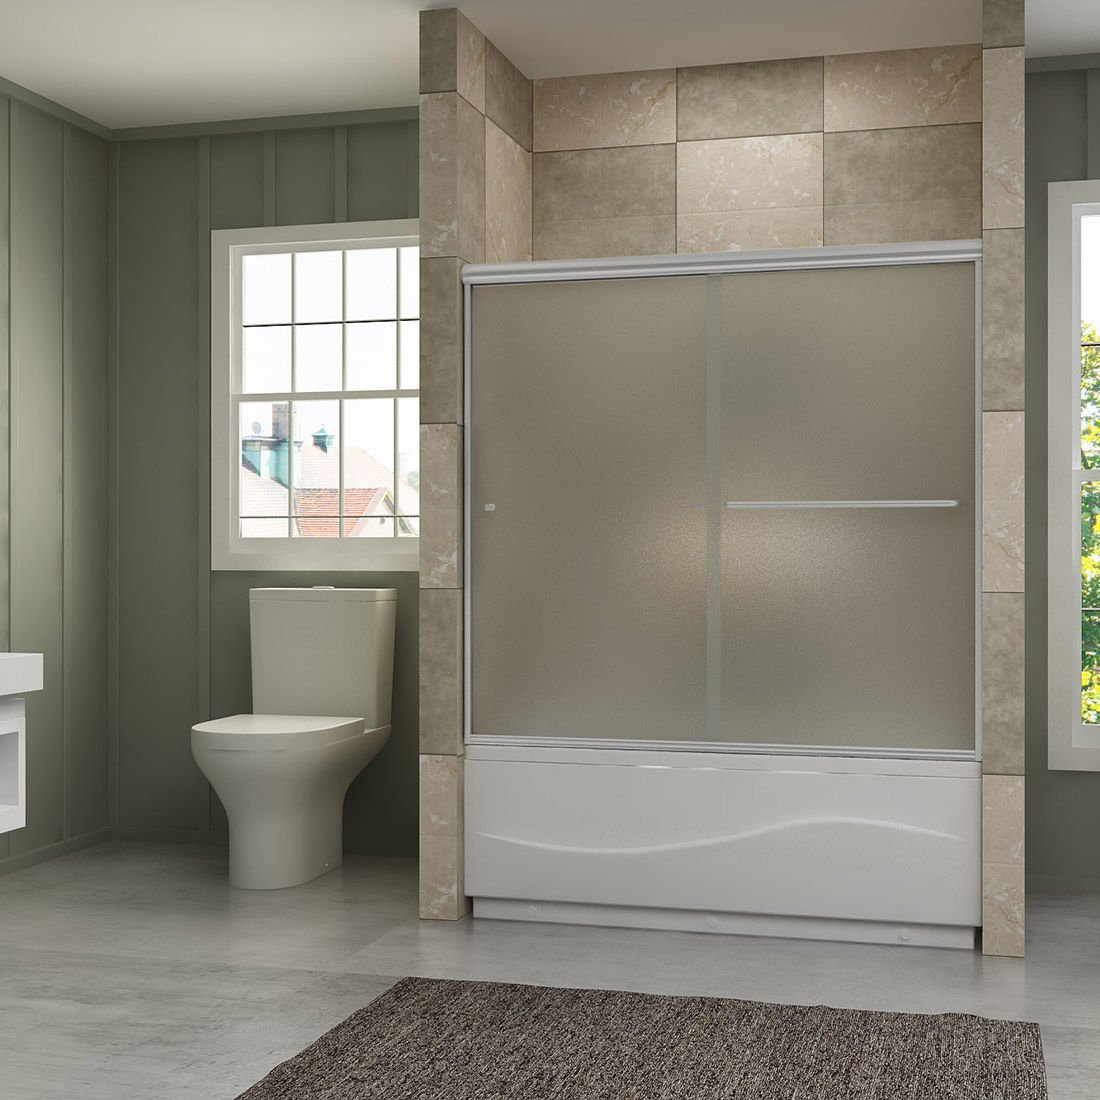 Cheap Glass Bathtub Shower Doors Find Glass Bathtub Shower